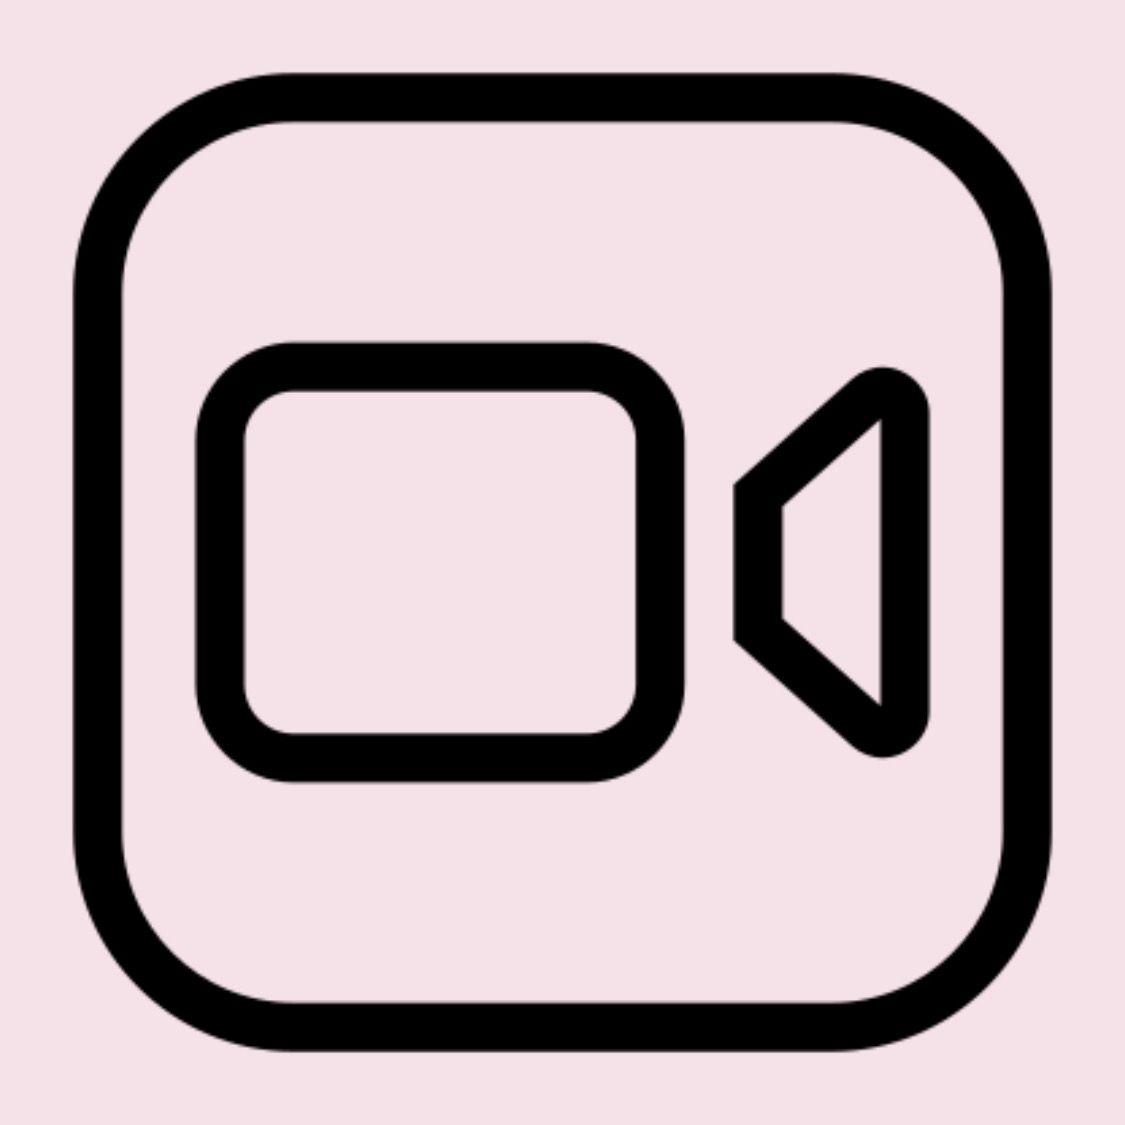 Facetime Icon In 2020 Logos App Facetime